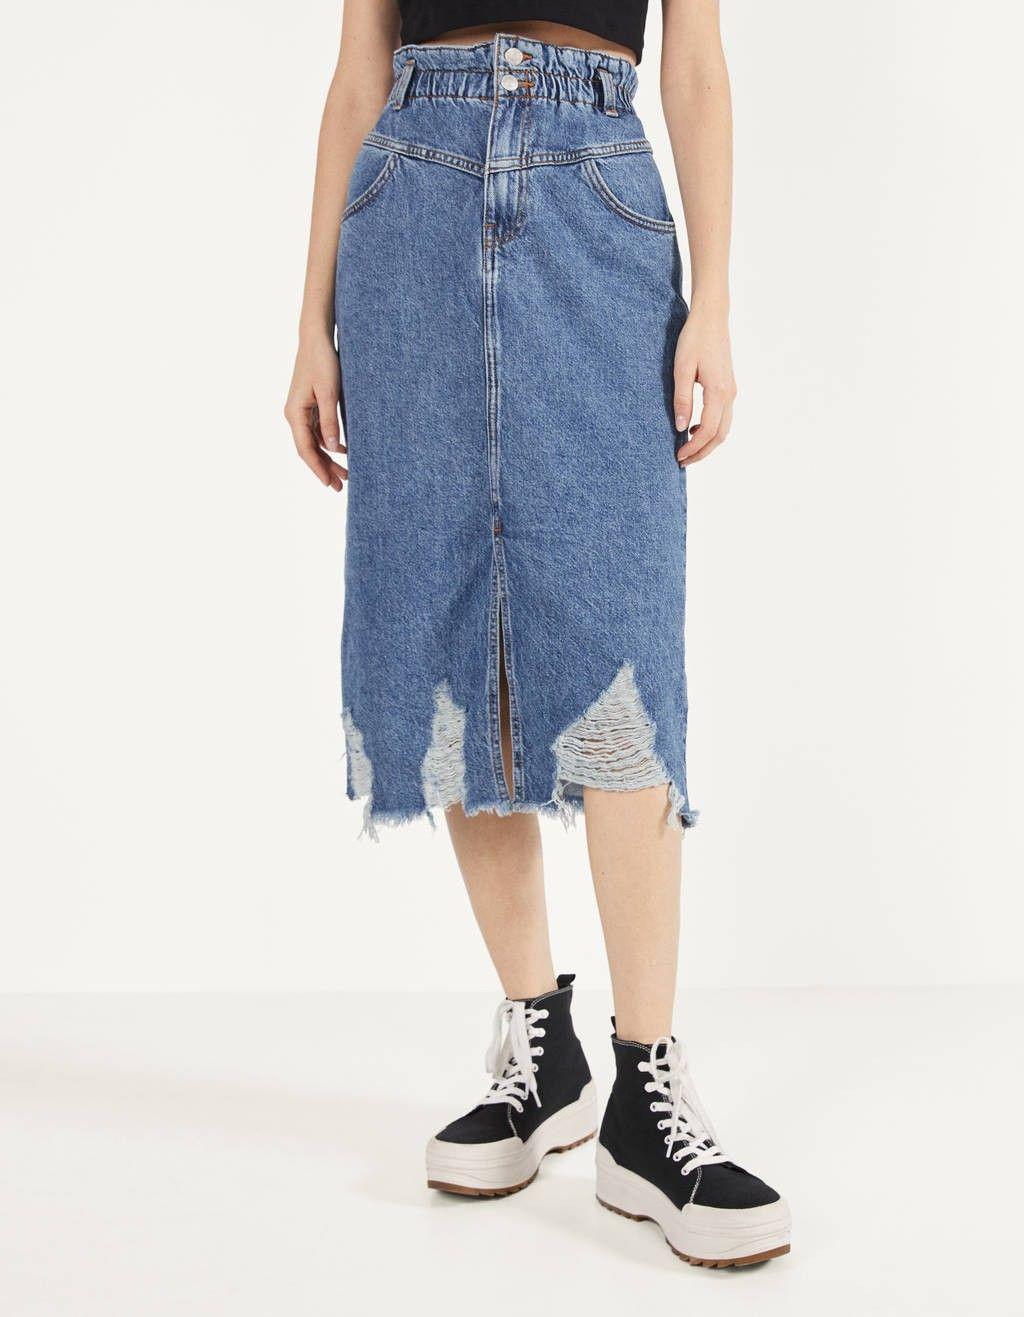 Pin On Skirts